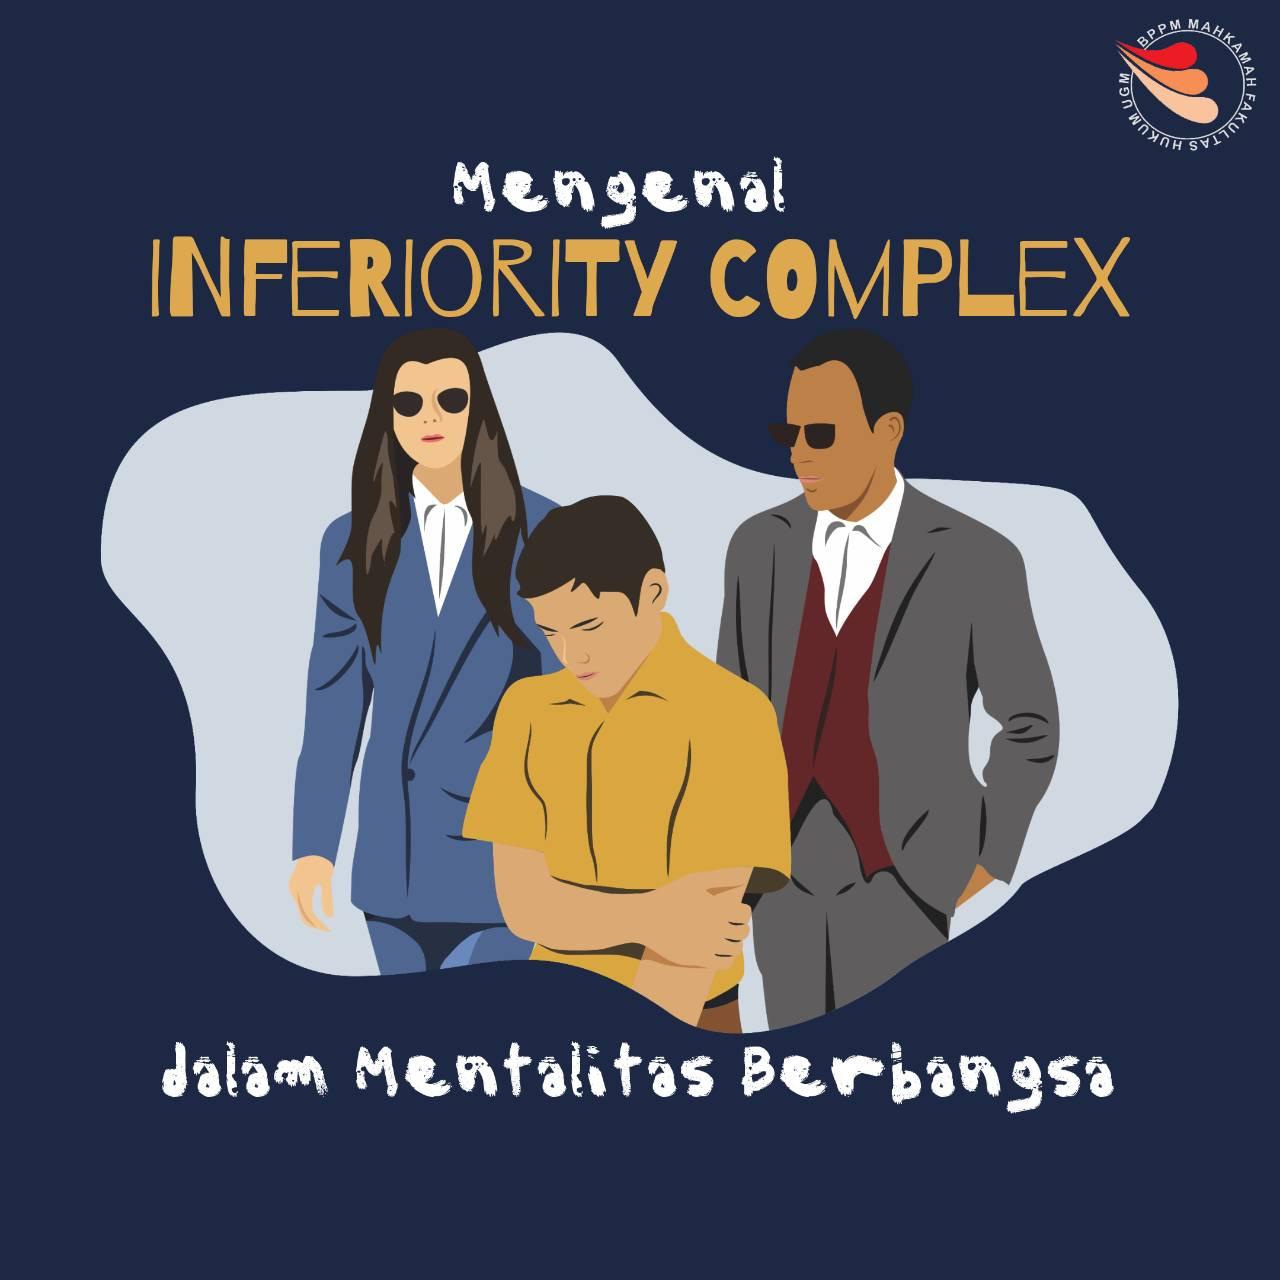 Mengenal Inferiority Complex dalam Mentalitas Berbangsa